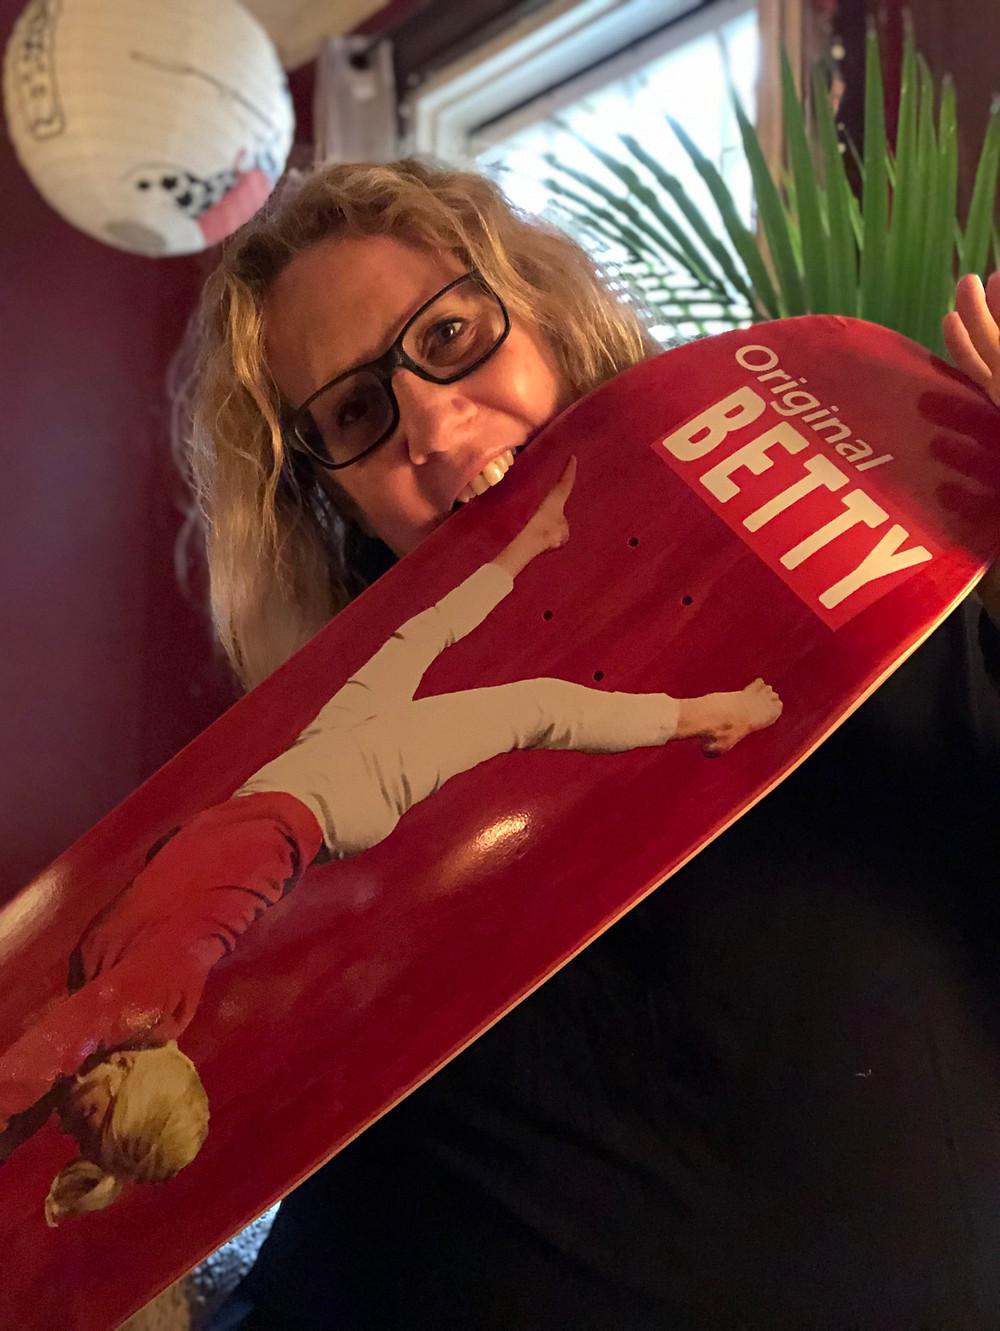 Silly Girl Skateboard Original Betty